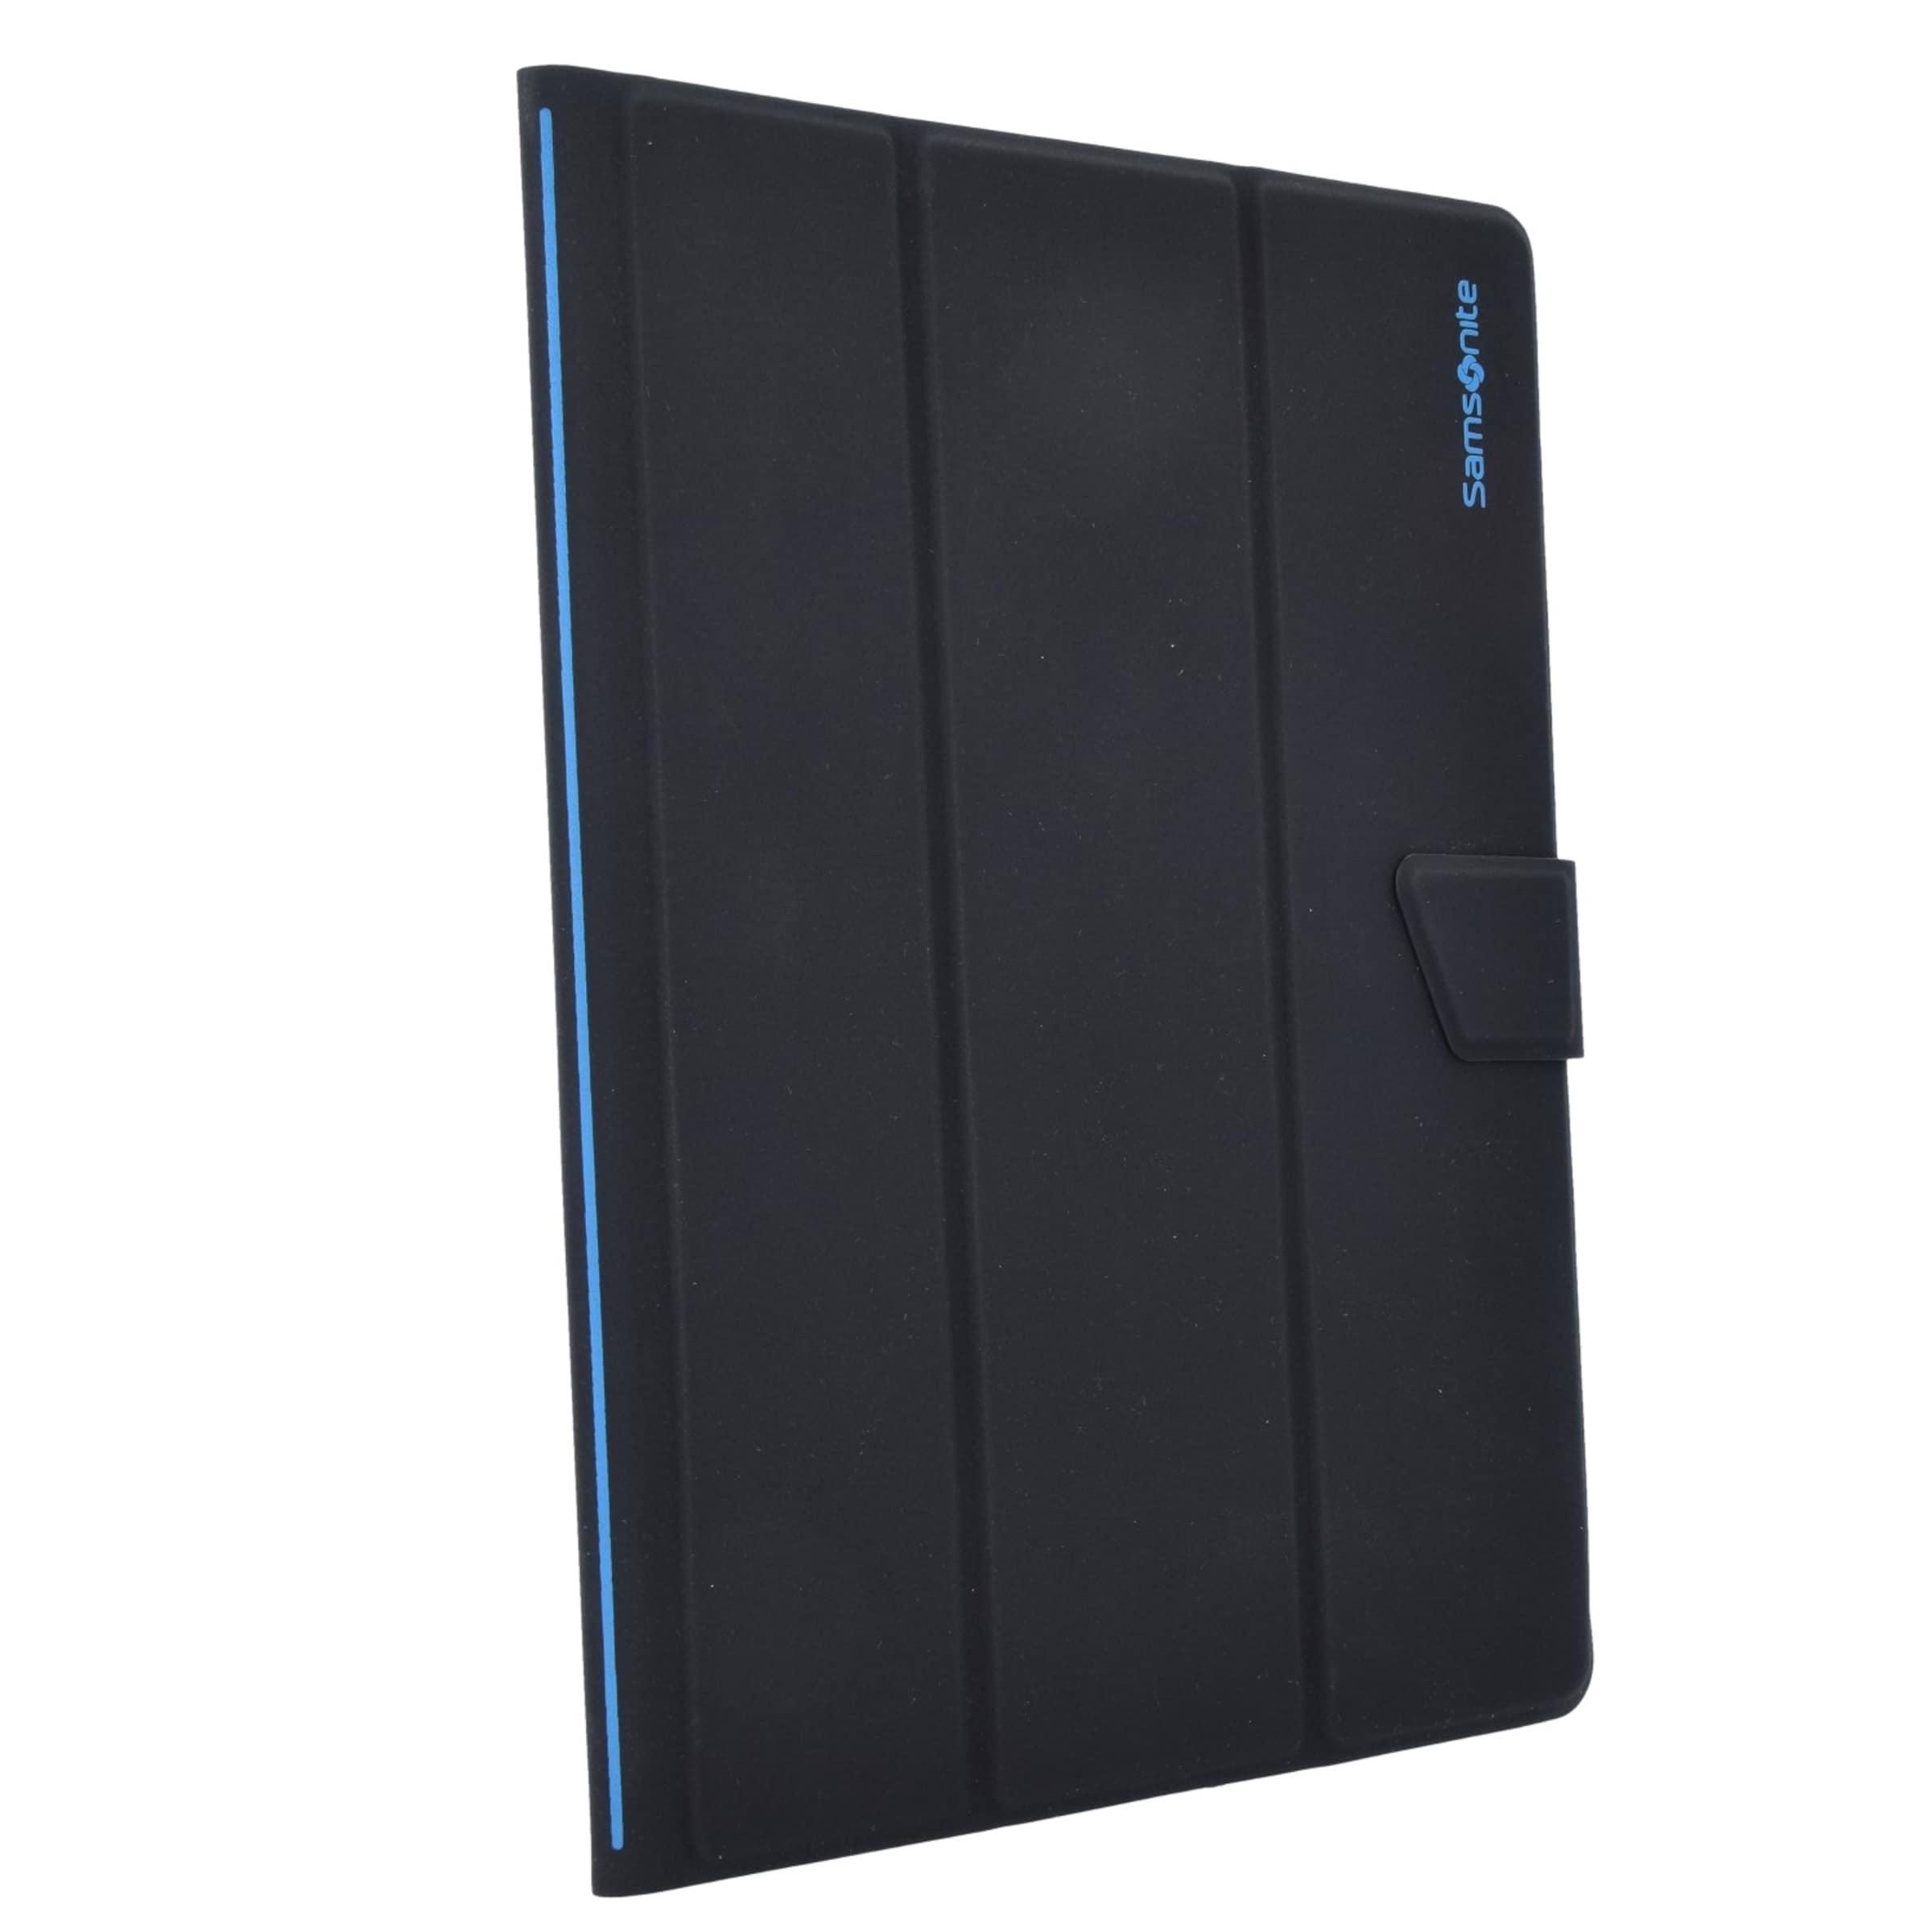 SAMSONITE cm 5 Tabzone Tablet 20 Case SAMSONITE Universal Tabzone UqzW1T6T